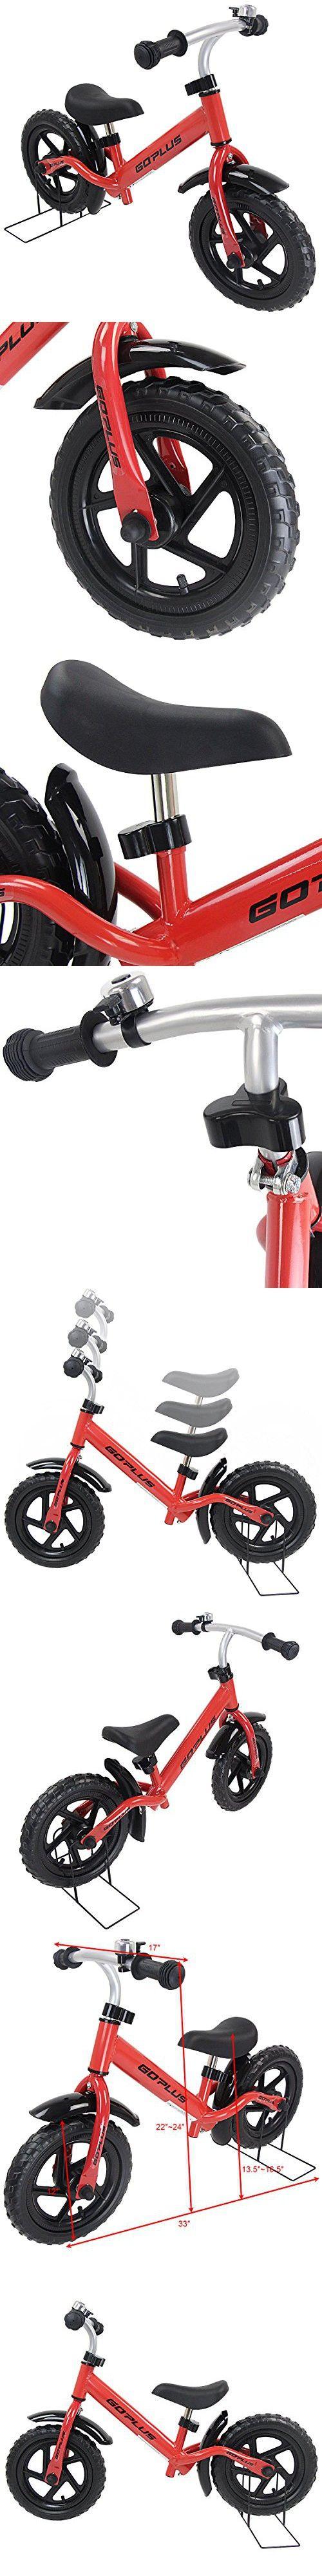 "Goplus 12"" Kids Balance Bike No Pedal Learn To Ride Pre Bike Push Walking"